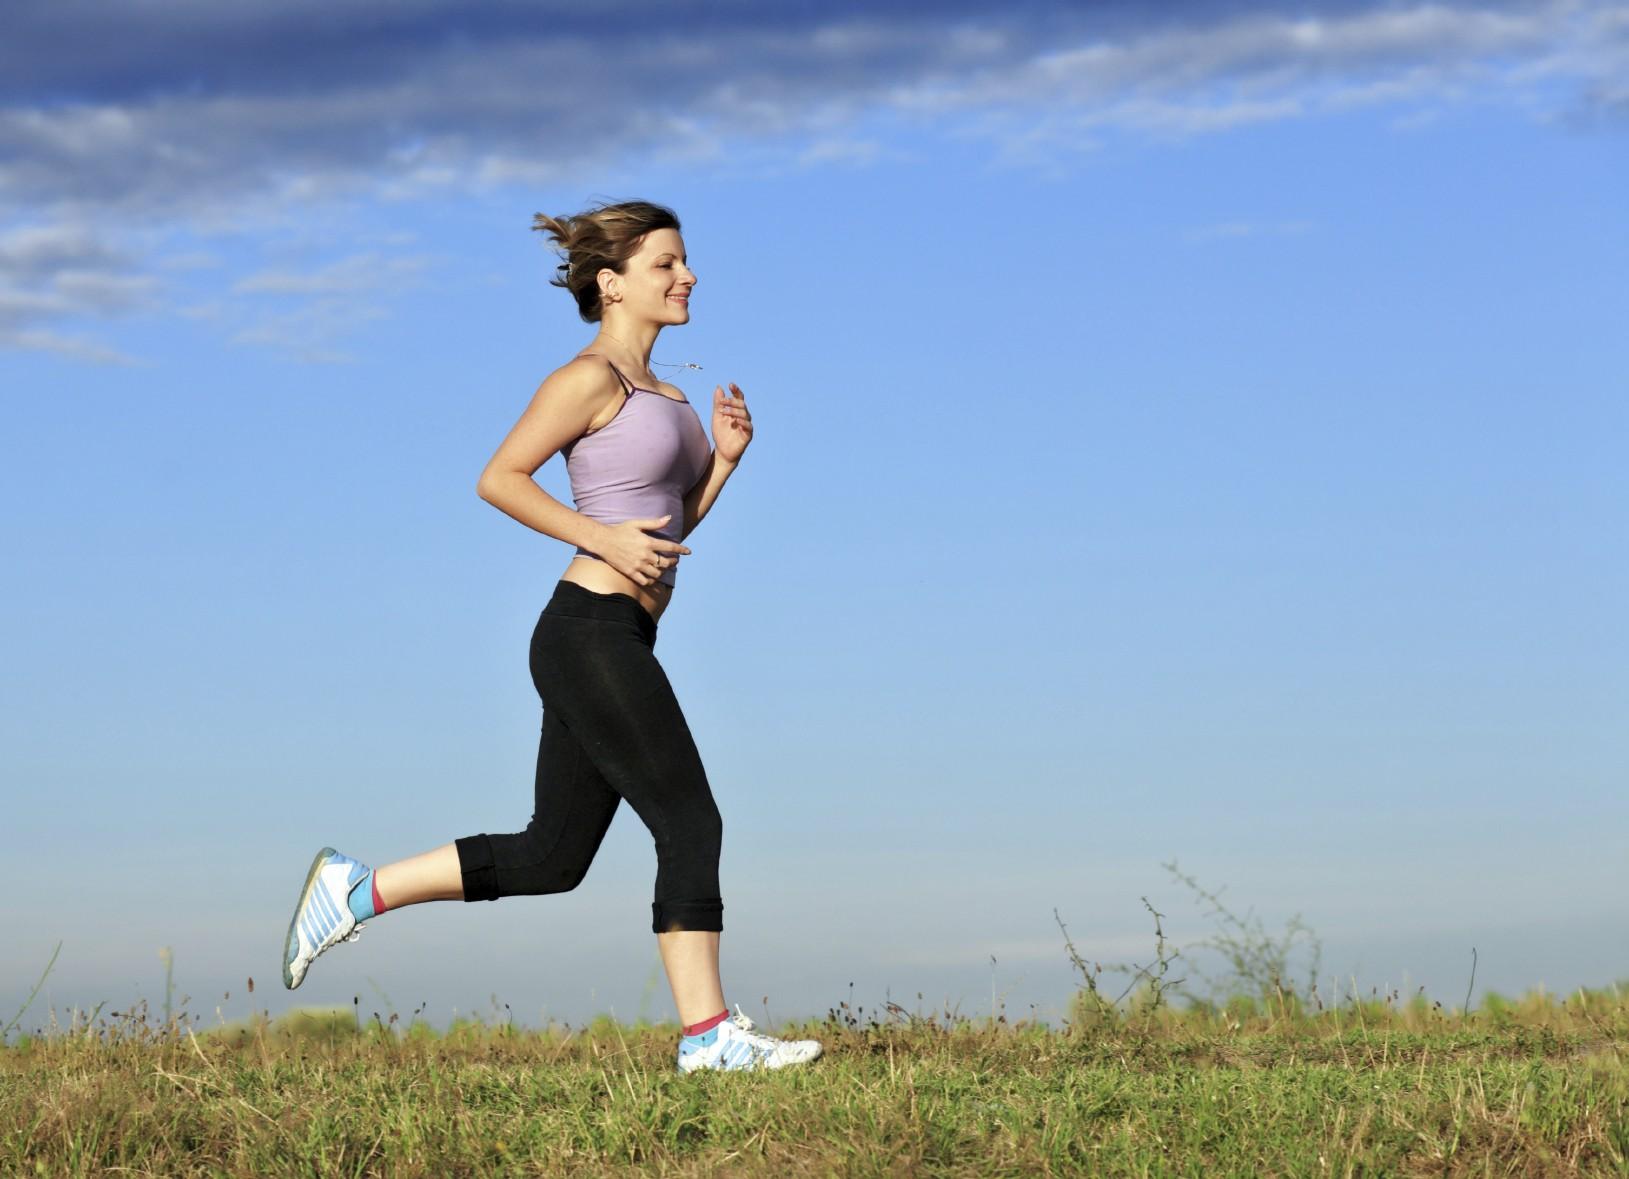 Sportolni magas vérnyomással is elengedhetetlen   Marie Claire